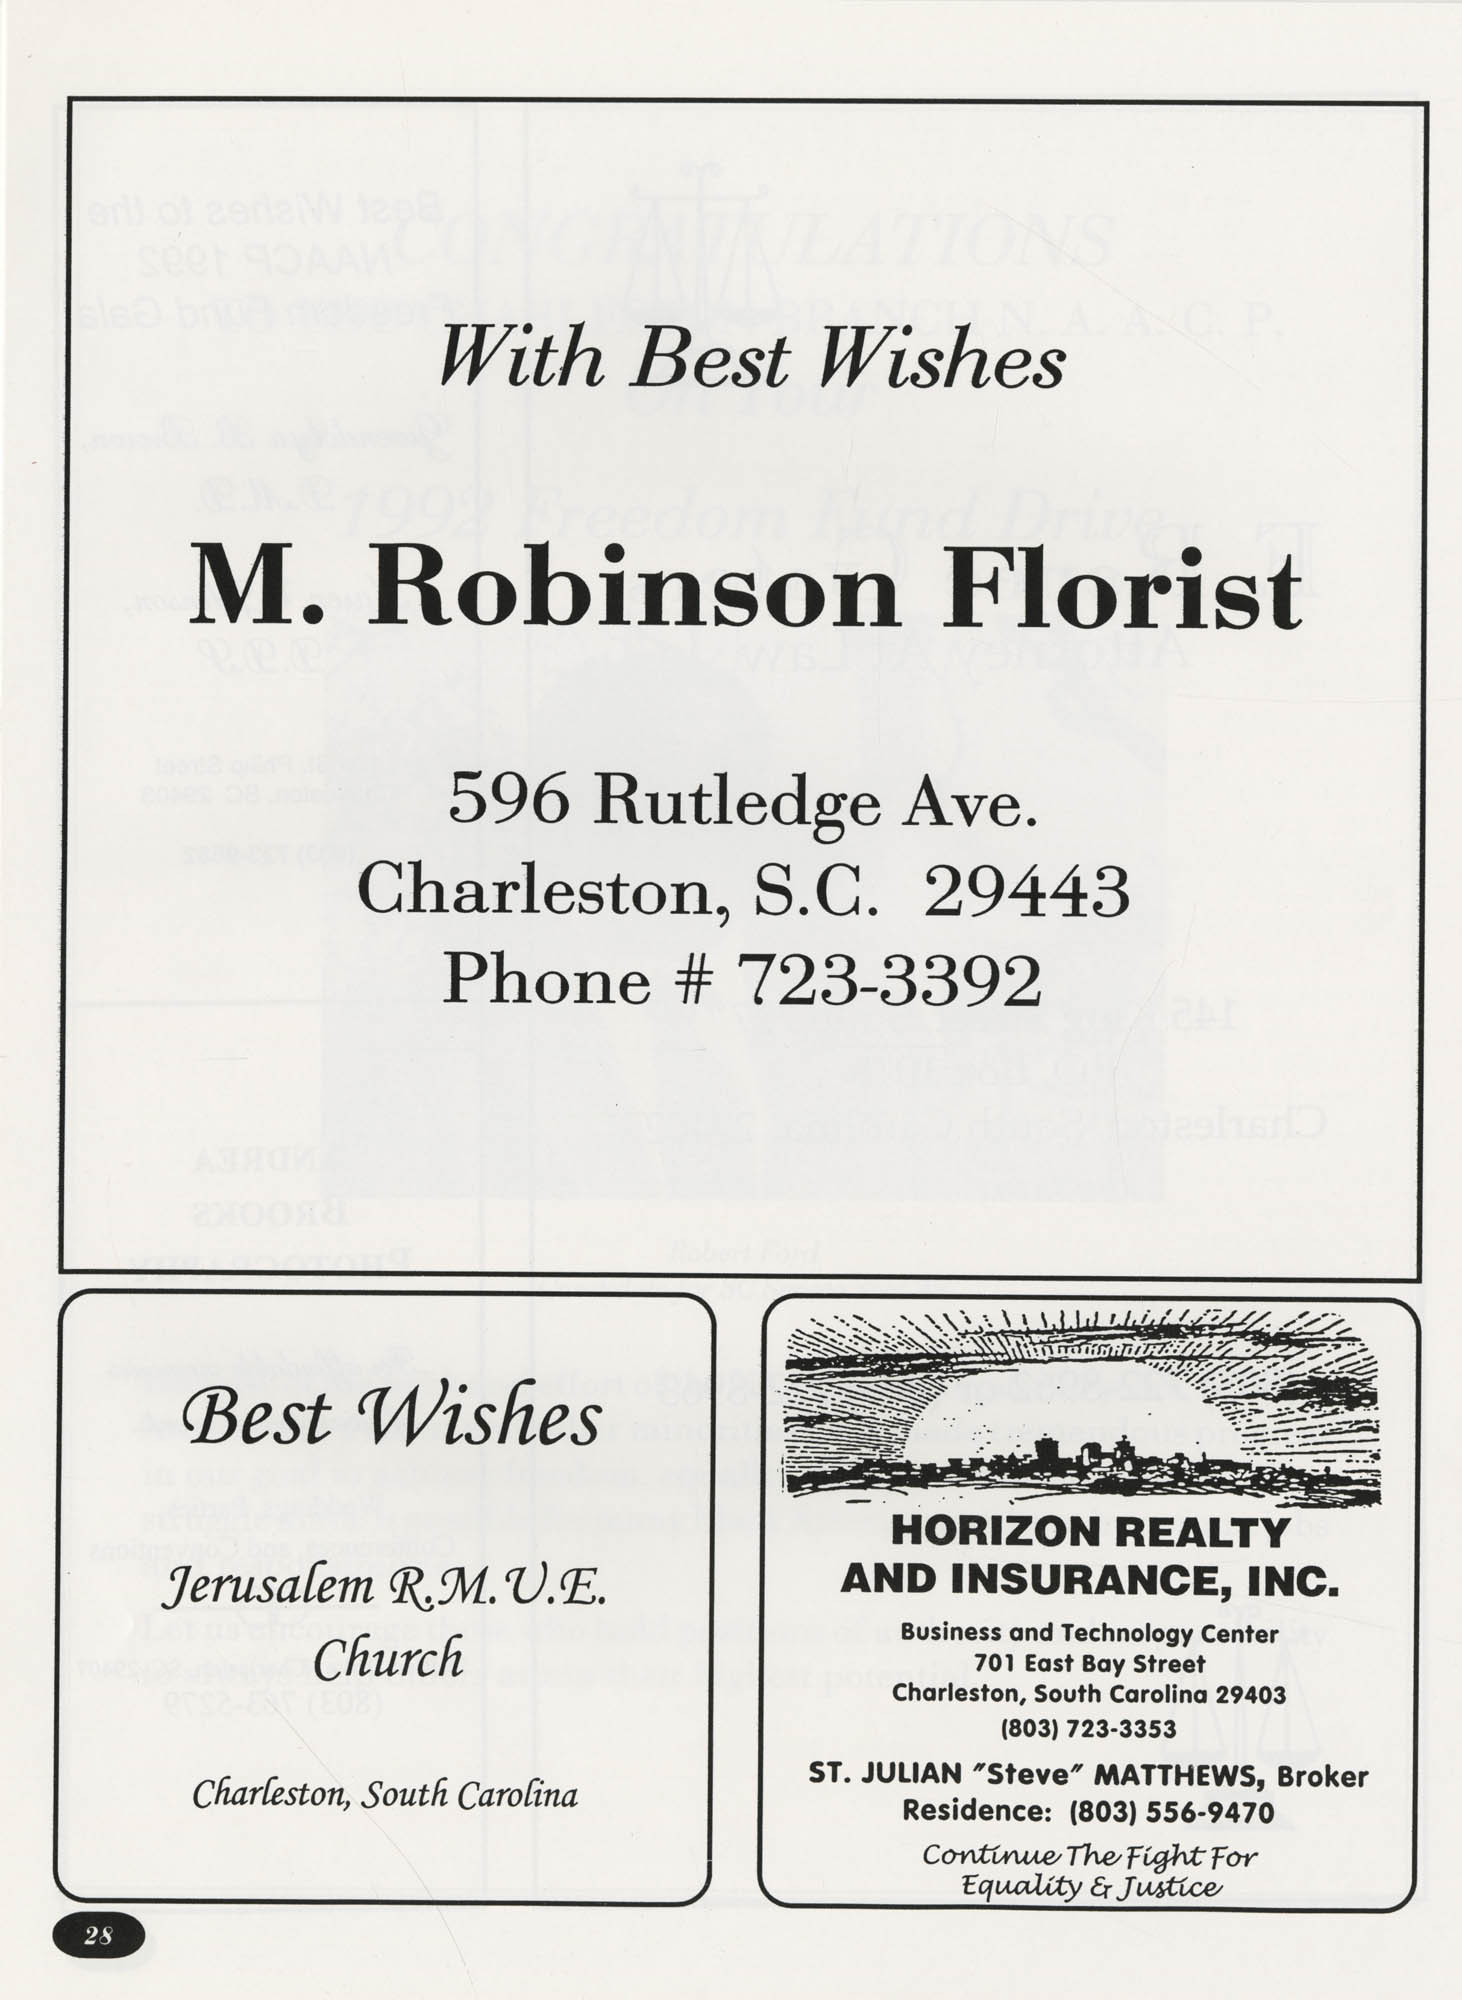 Freedom Fund Magazine, 1992, Page 28